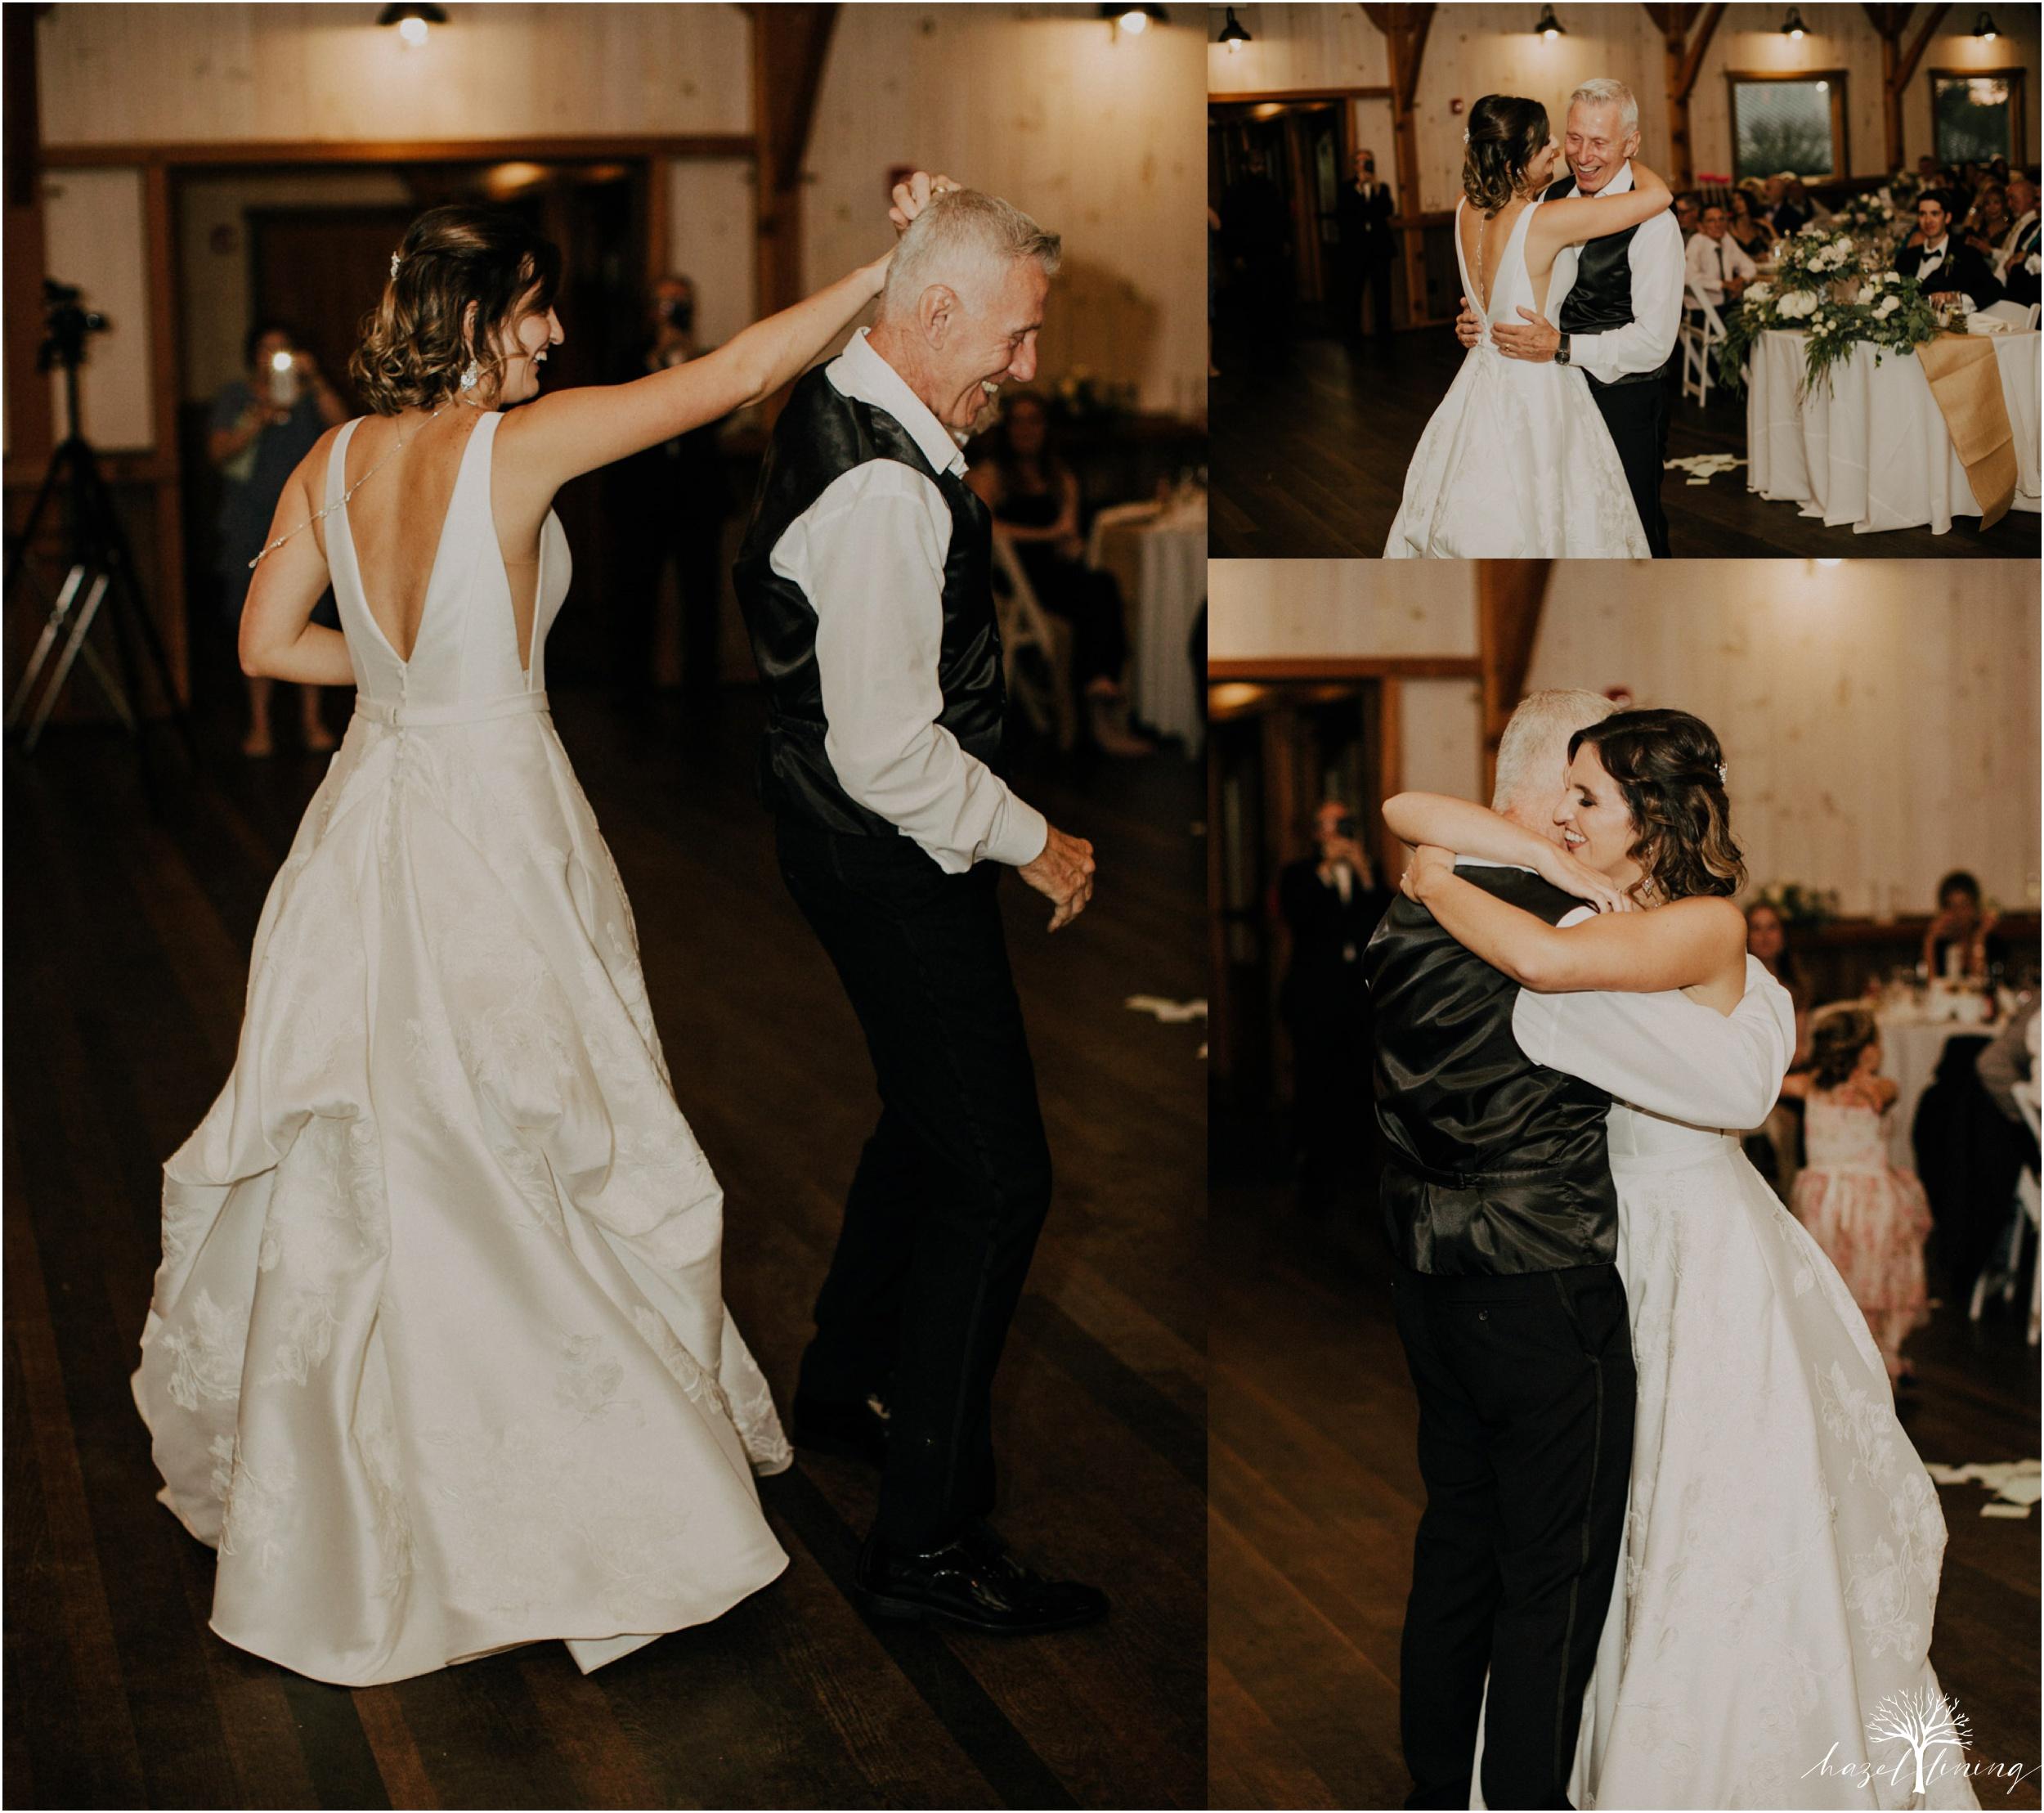 maureen-hepner-anthony-giordano-rose-bank-winery-newtow-pennsylvania-luxury-summer-wedding-hazel-lining-photography-destination-elopement-wedding-engagement-photography_0145.jpg